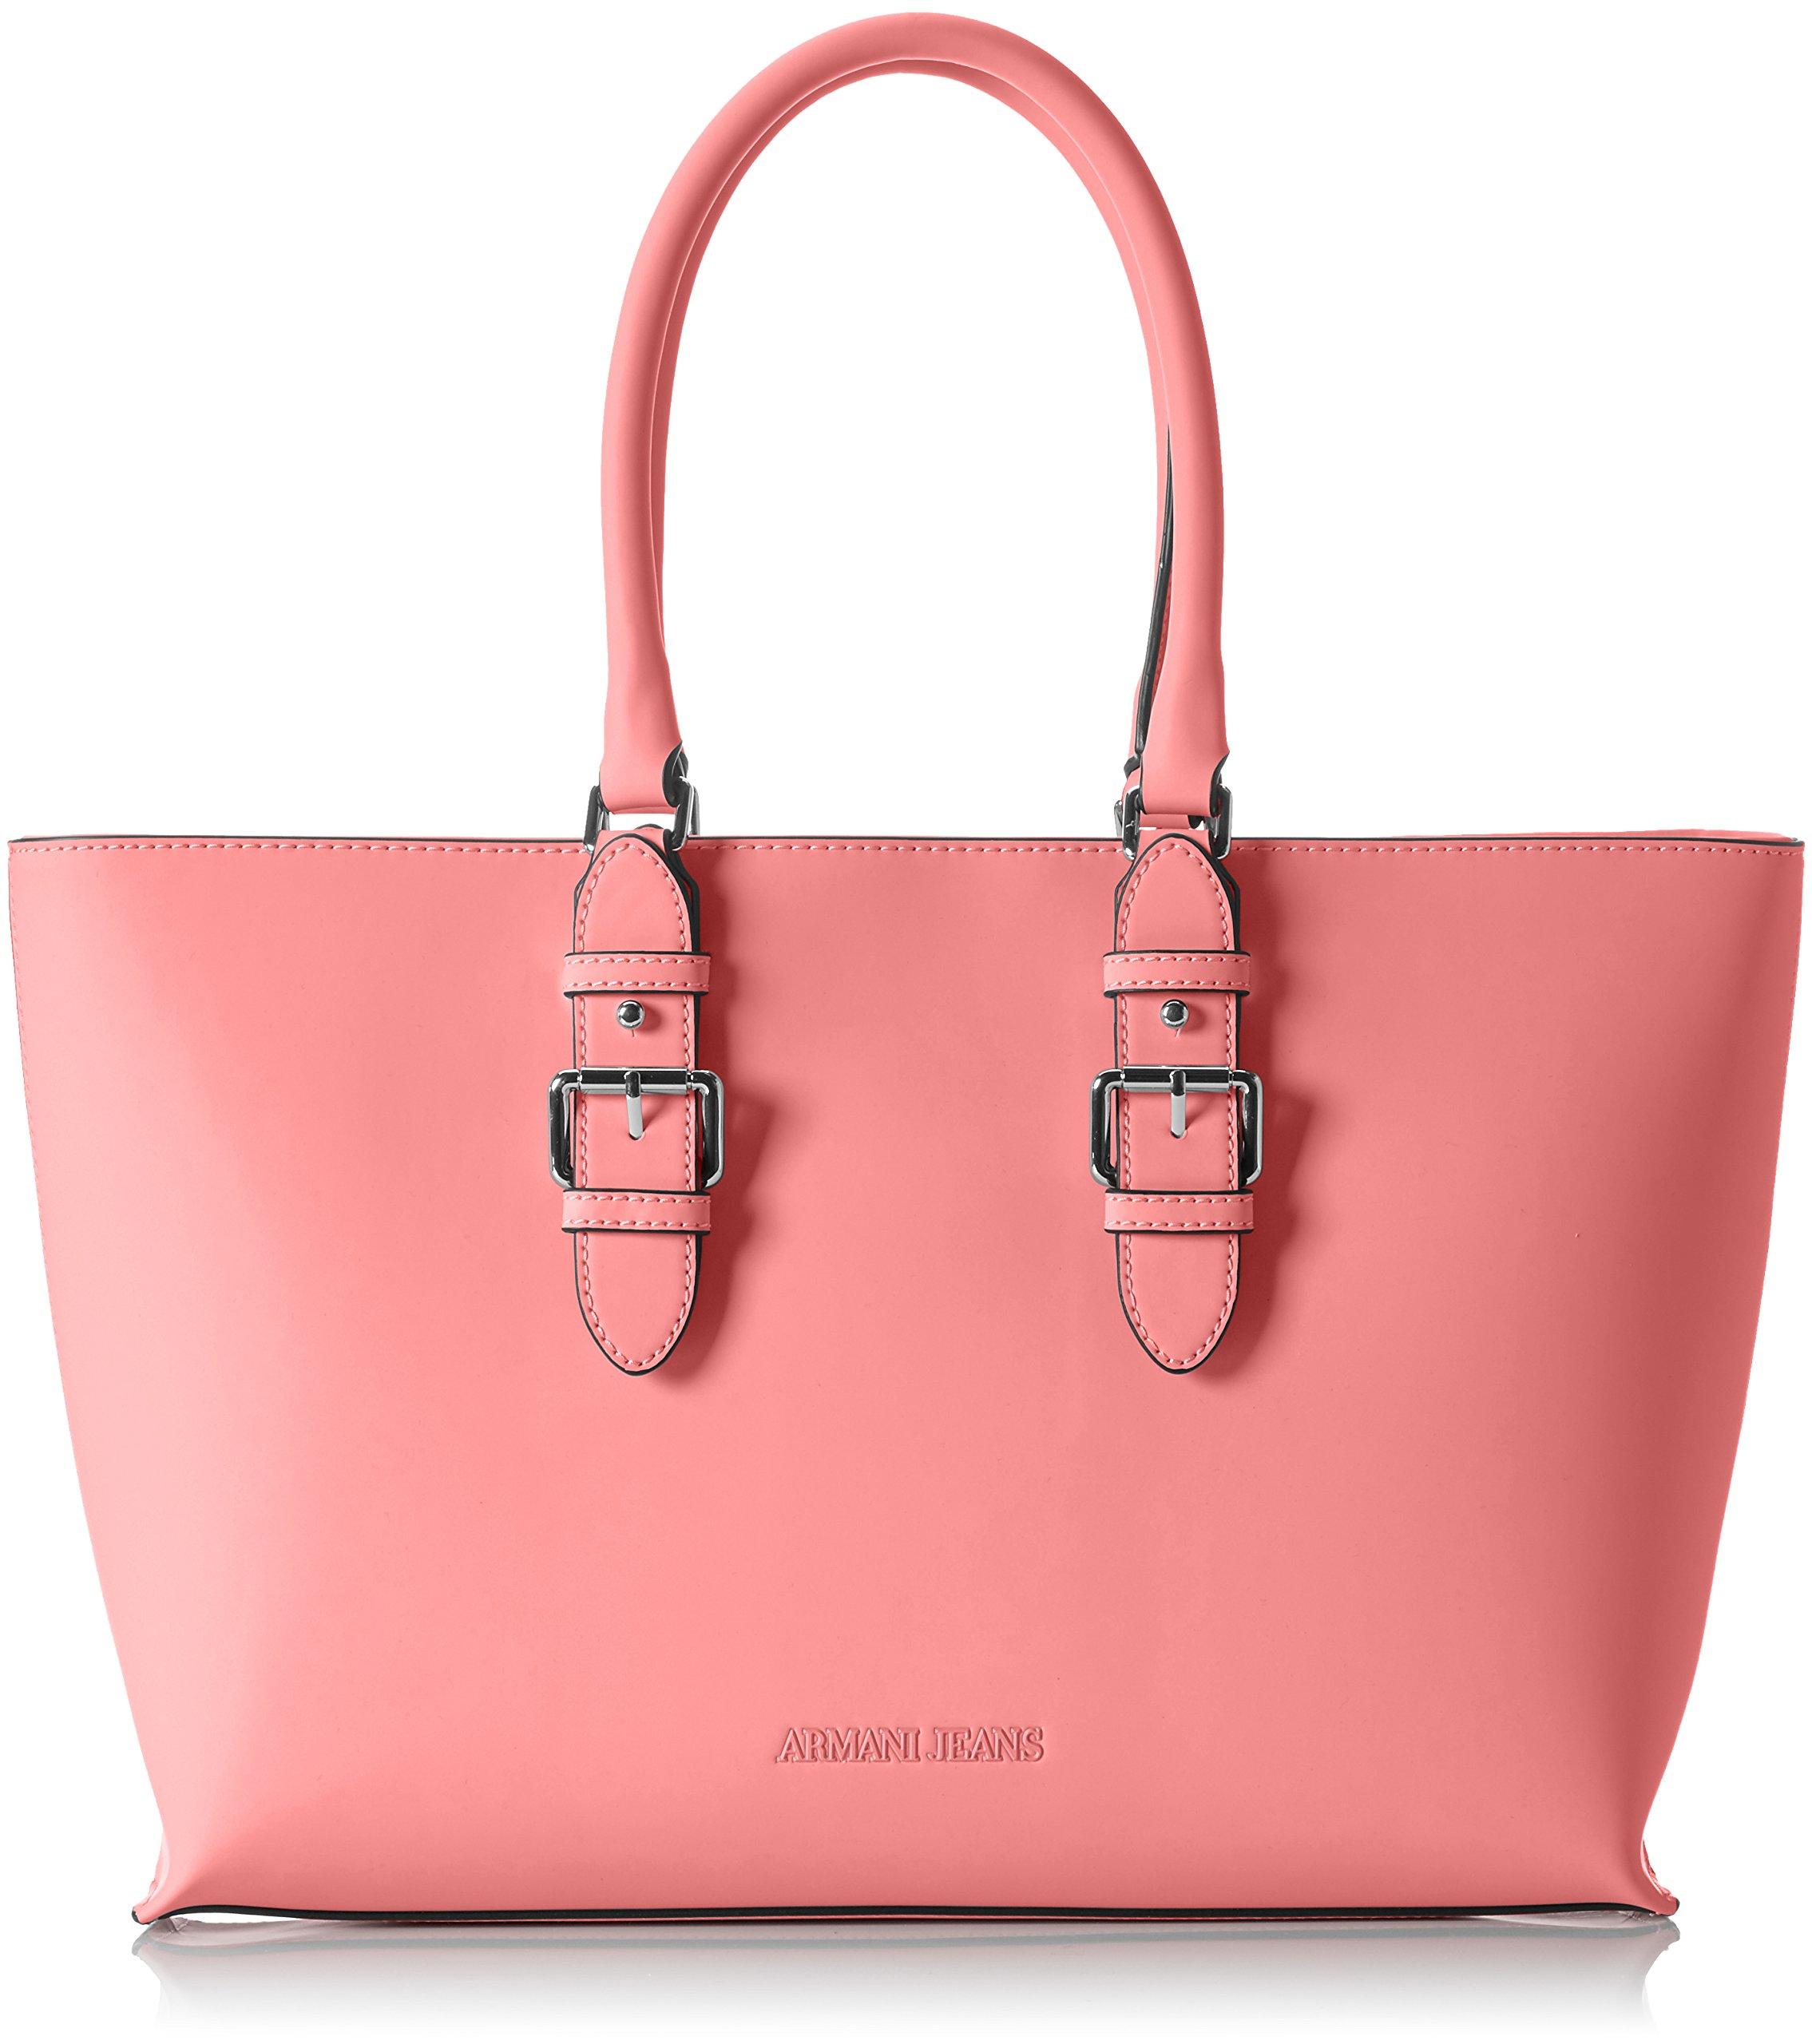 Pink ONE SIZE Armani Jeans Womens Handbag Pink 922210 7P772 08170